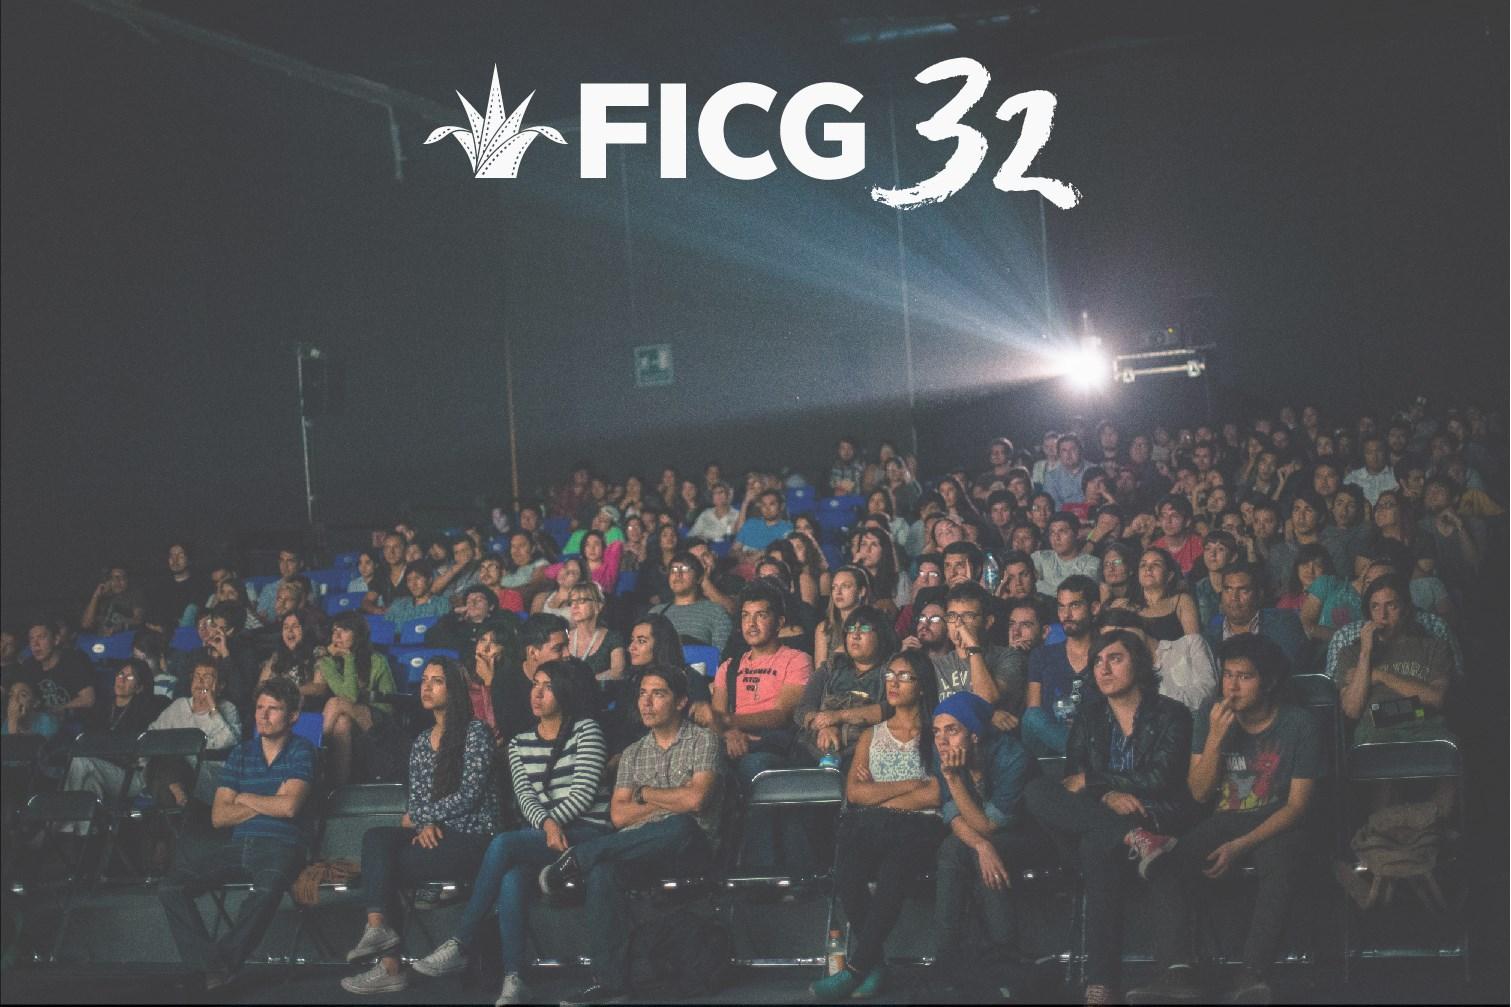 ficg-32